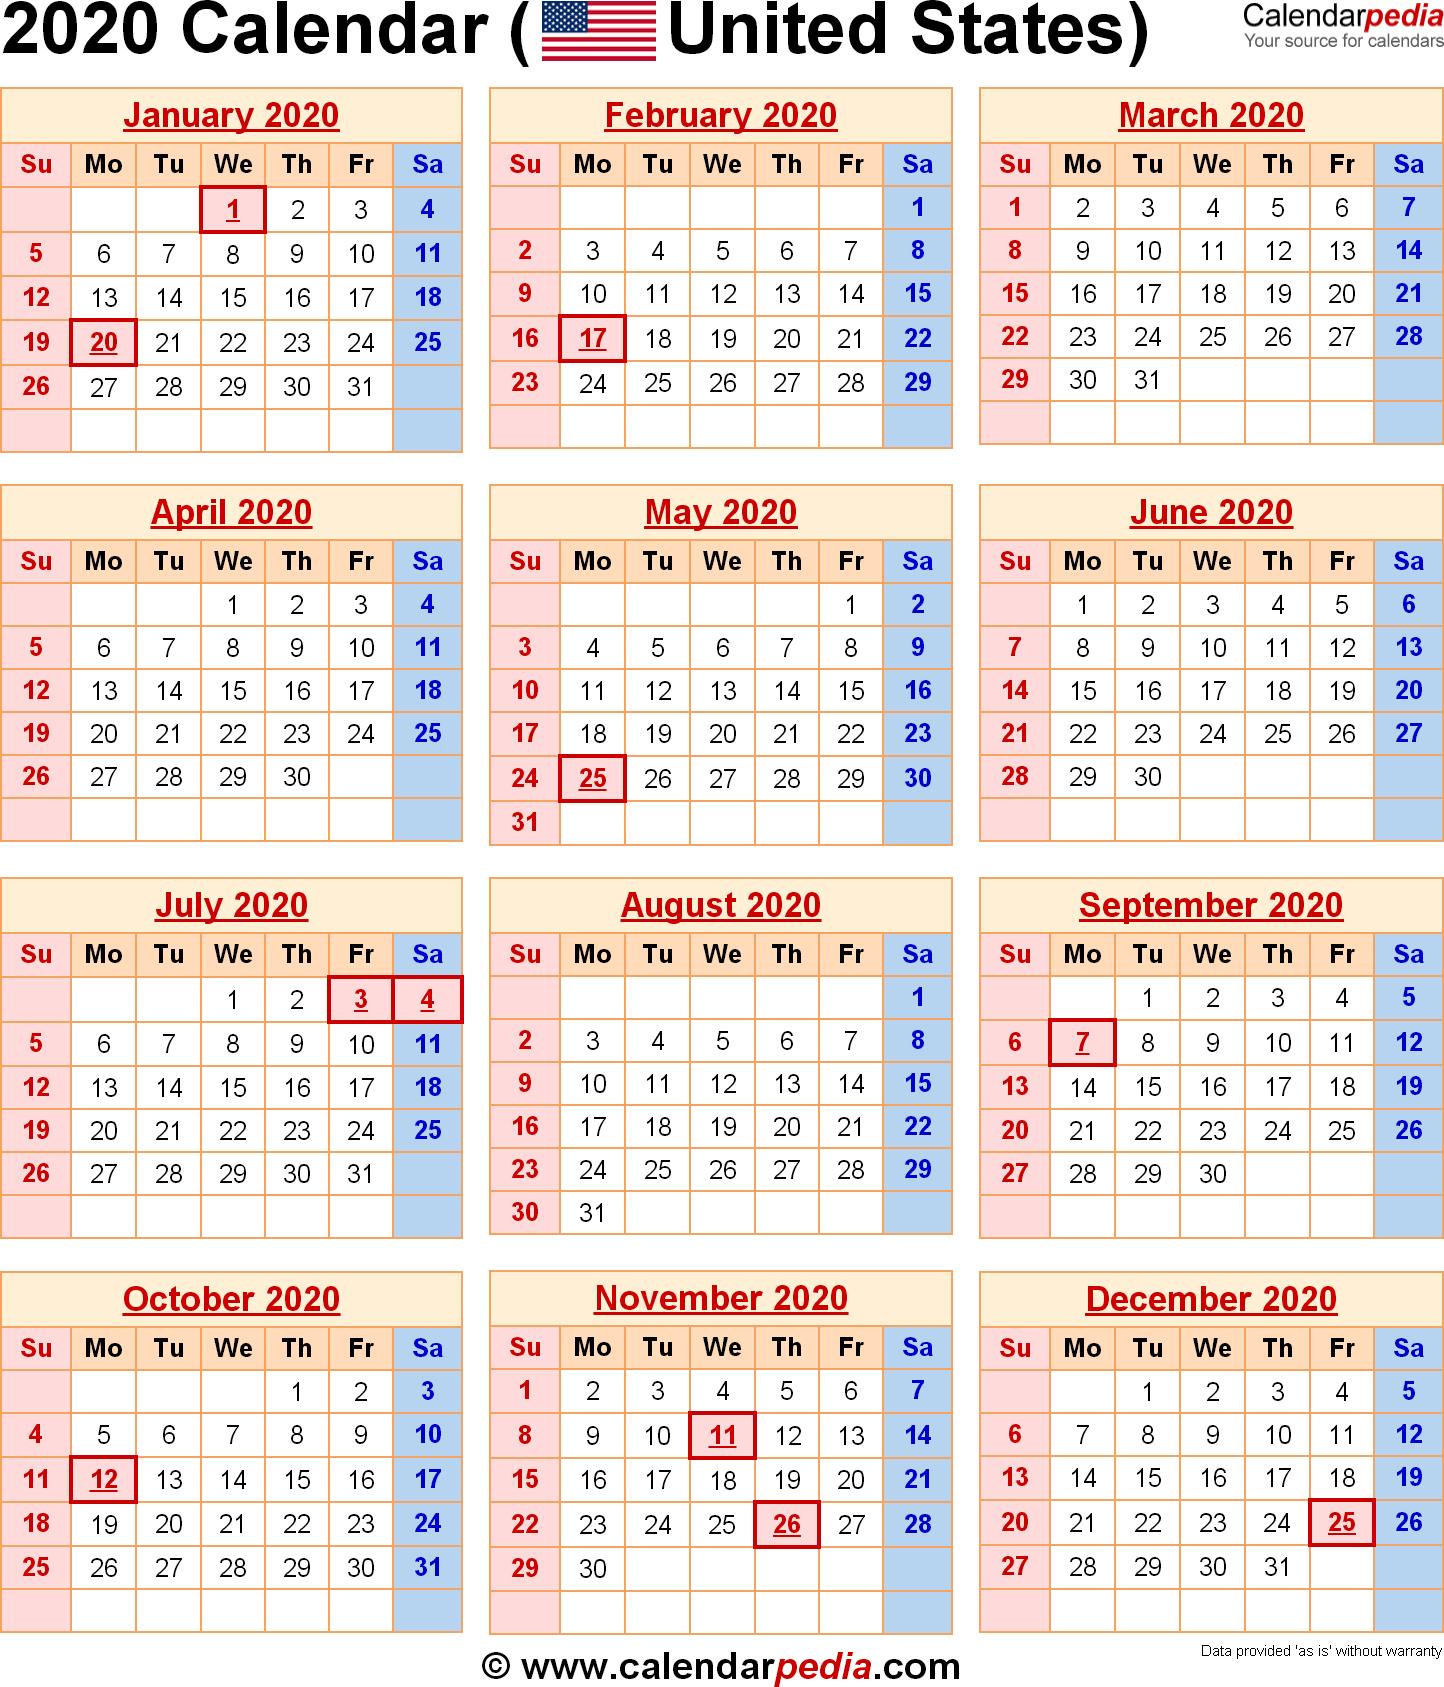 2020 Us Calendar With Holidays Printable - Wpa.wpart.co pertaining to 2020 Calendar With Holidays